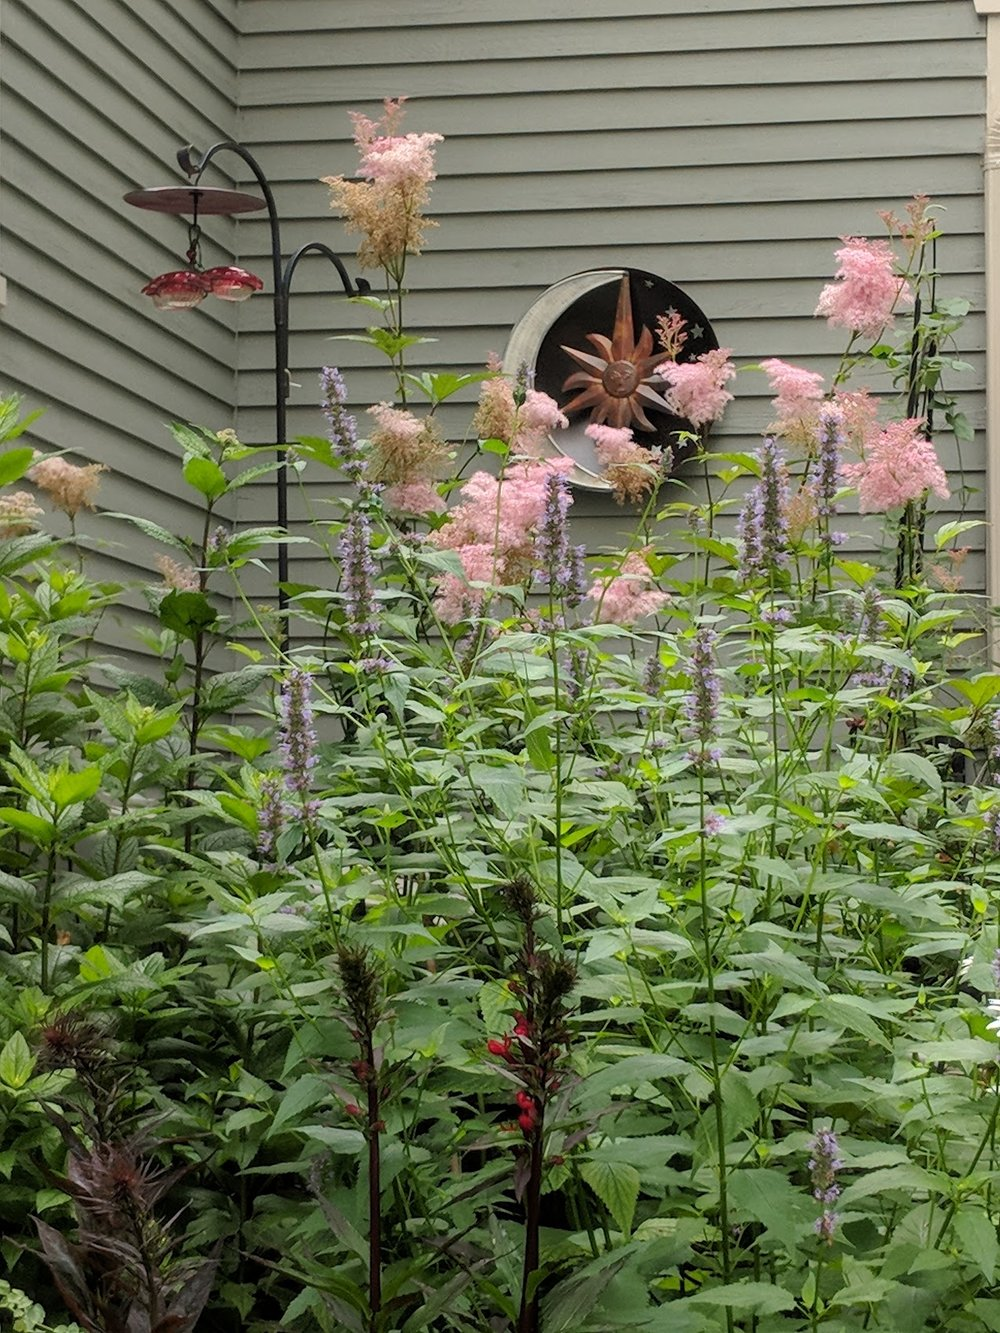 July 16: Pink Filipendula 'Queen of Prairie and purple Agastache 'Black Adder' take a turn